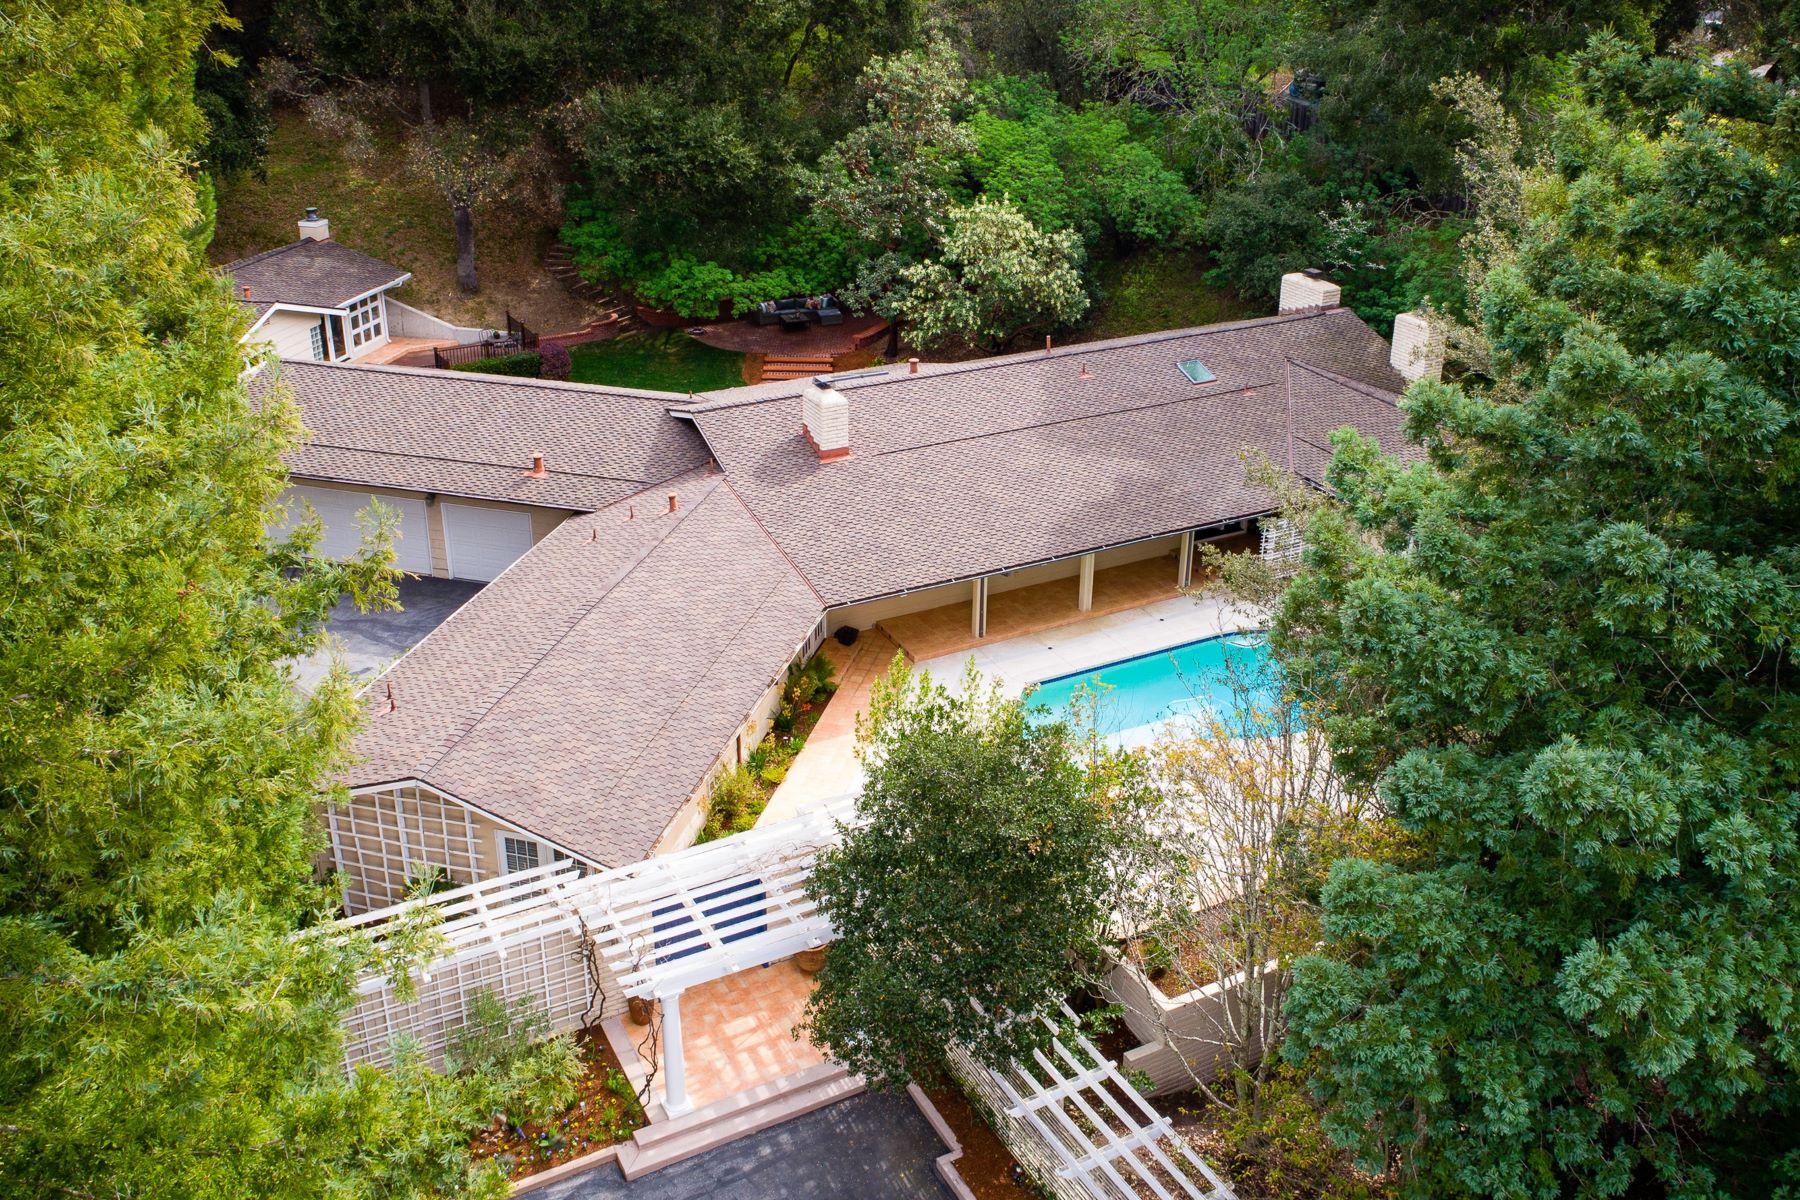 Single Family Homes para Venda às The Ultimate Silicon Valley Getaway in Central Portola Valley 286 Willowbrook Drive, Portola Valley, Califórnia 94028 Estados Unidos